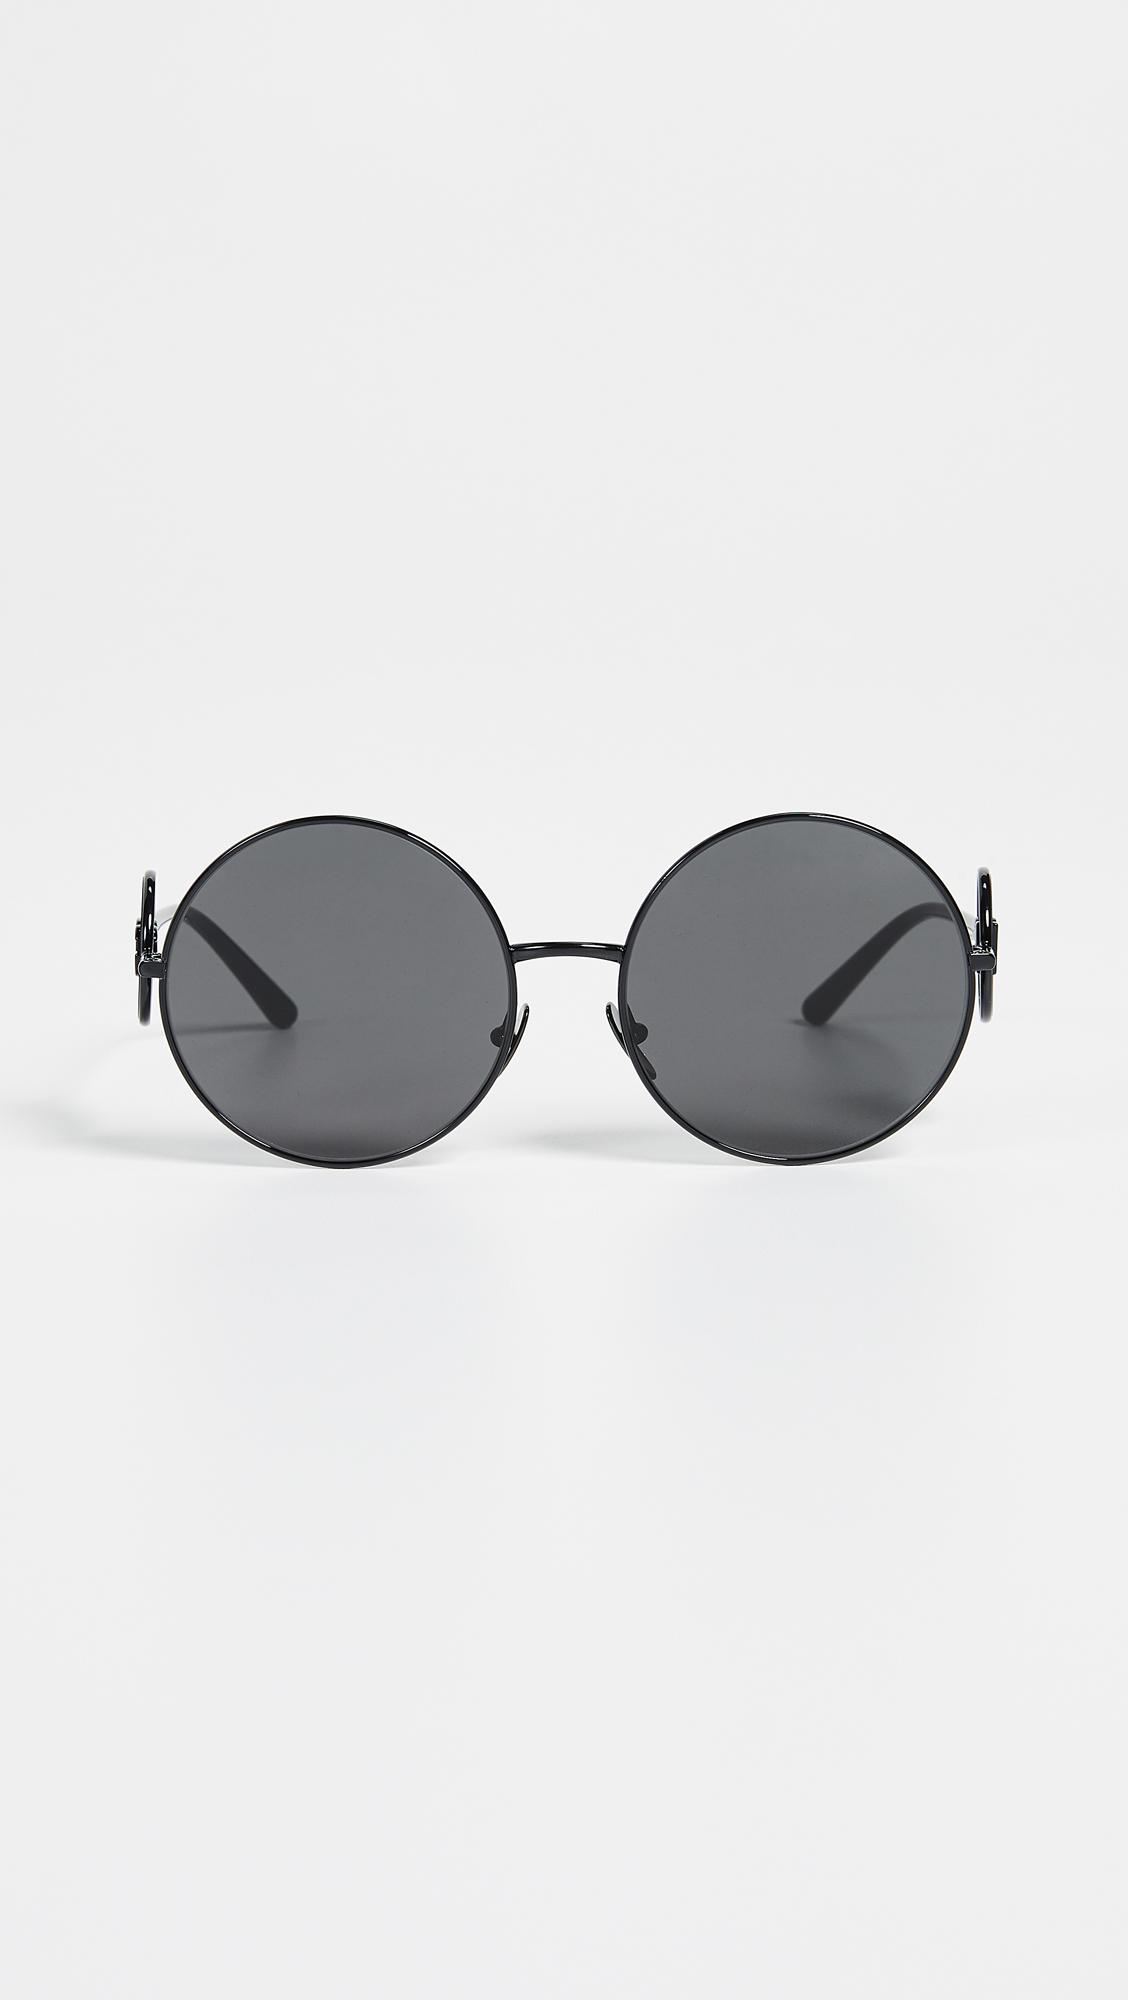 96f5e178588d Dolce & Gabbana Sicilian Sweet Round Sunglasses | SHOPBOP